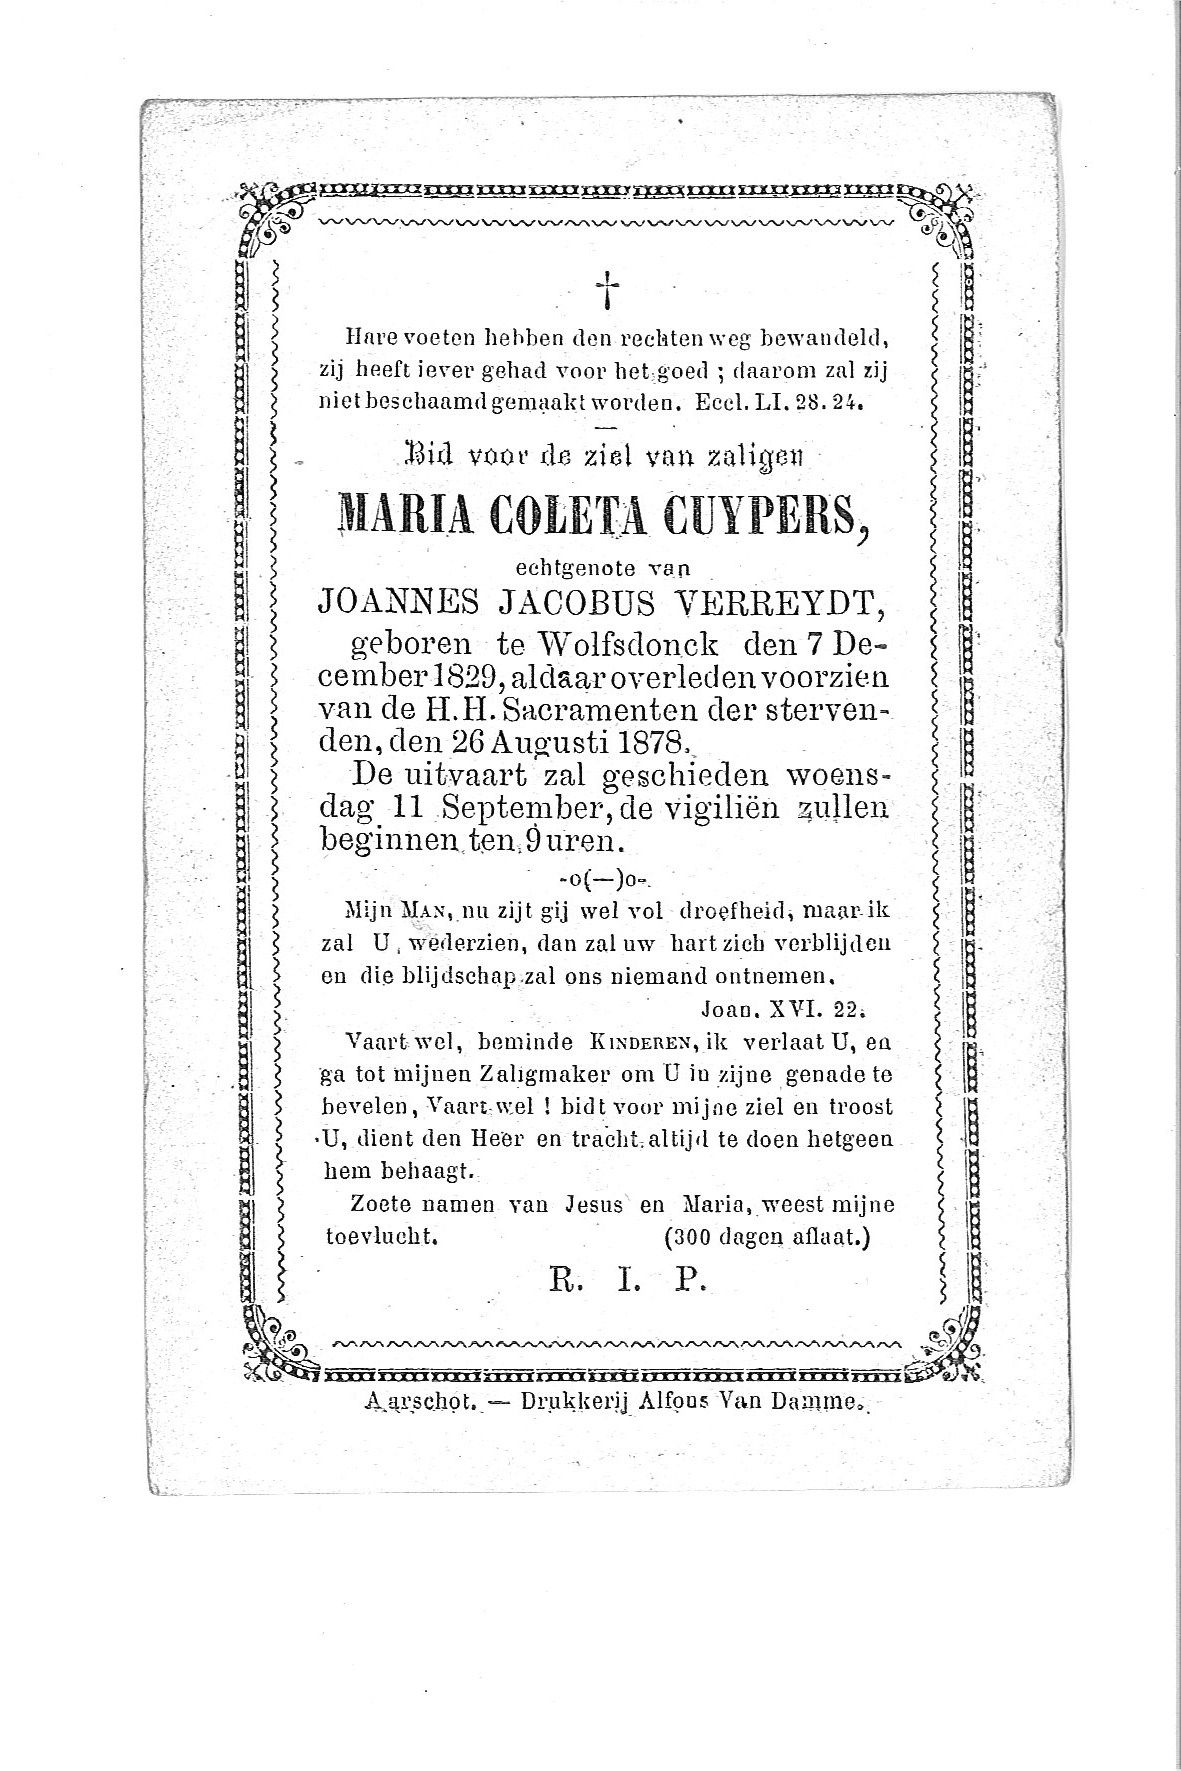 maria-coleta(1878)20090323101150_00043.jpg